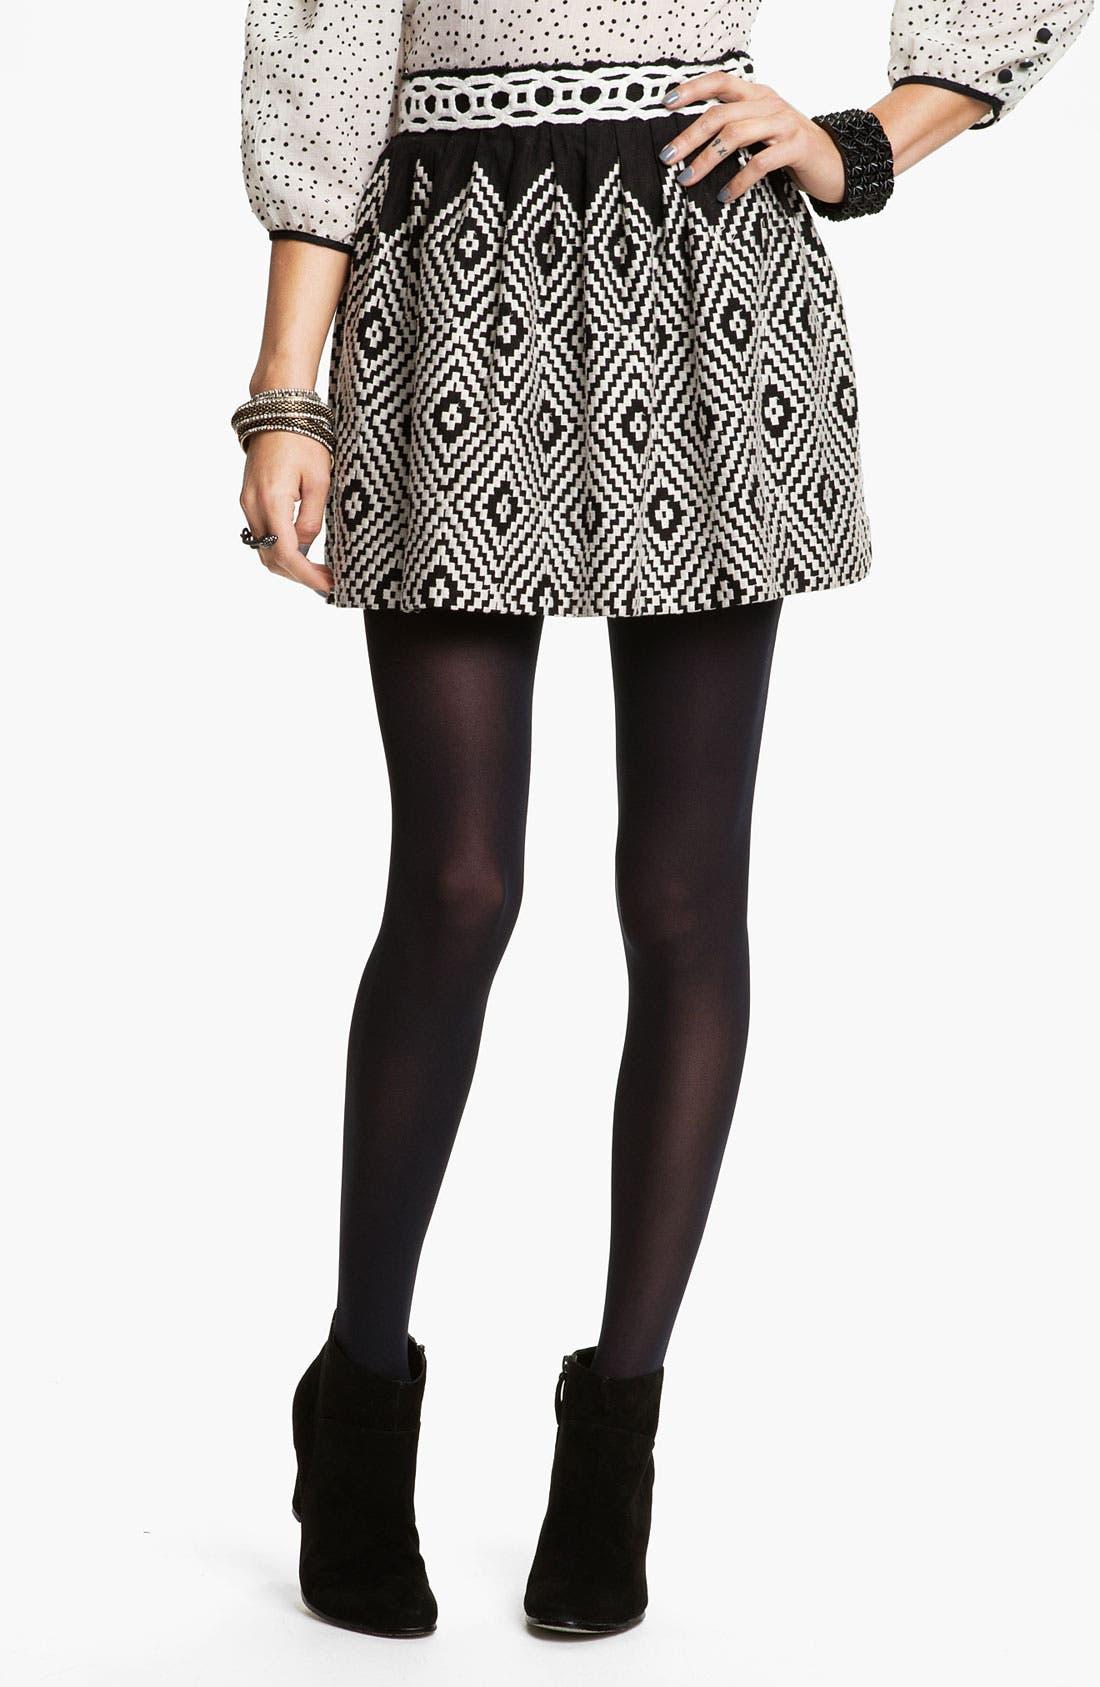 Alternate Image 1 Selected - Free People 'Alexus' Op Art Embroidered Skirt